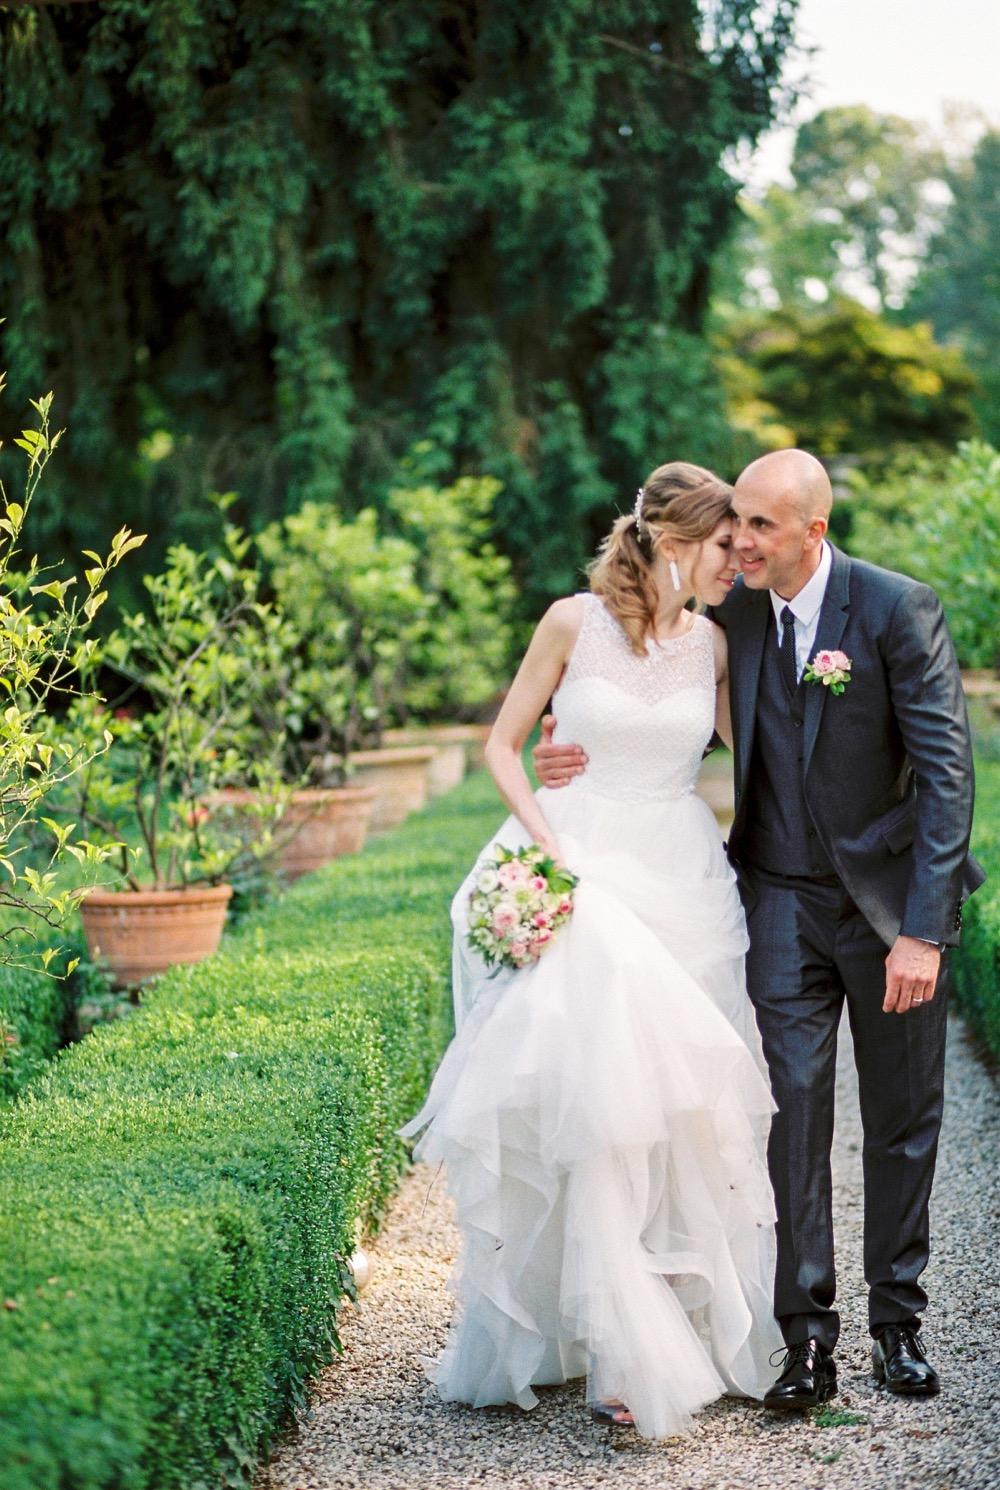 darya kamalova thecablookfotolab fine art film fhotographer in italy destination wedding como lake villa regina teodolinda villa pisani scalabrin-315